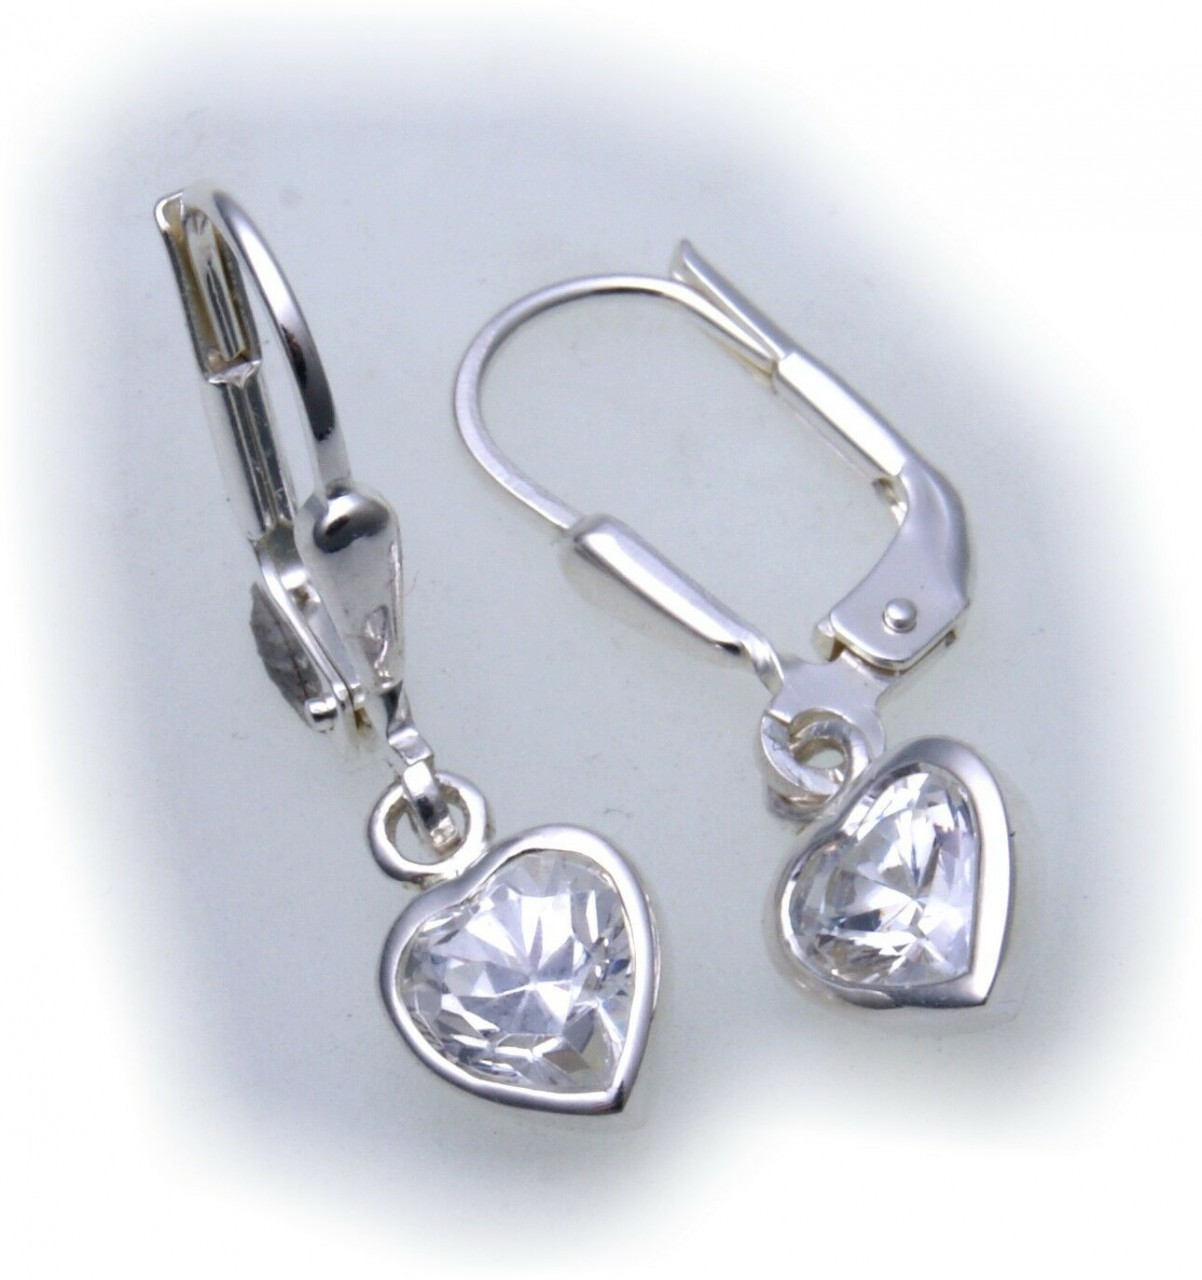 Damen Ohrringe Hänger Herz mit Zirkonia echt Silber 925 Sterlingsilber Z2317 ZI